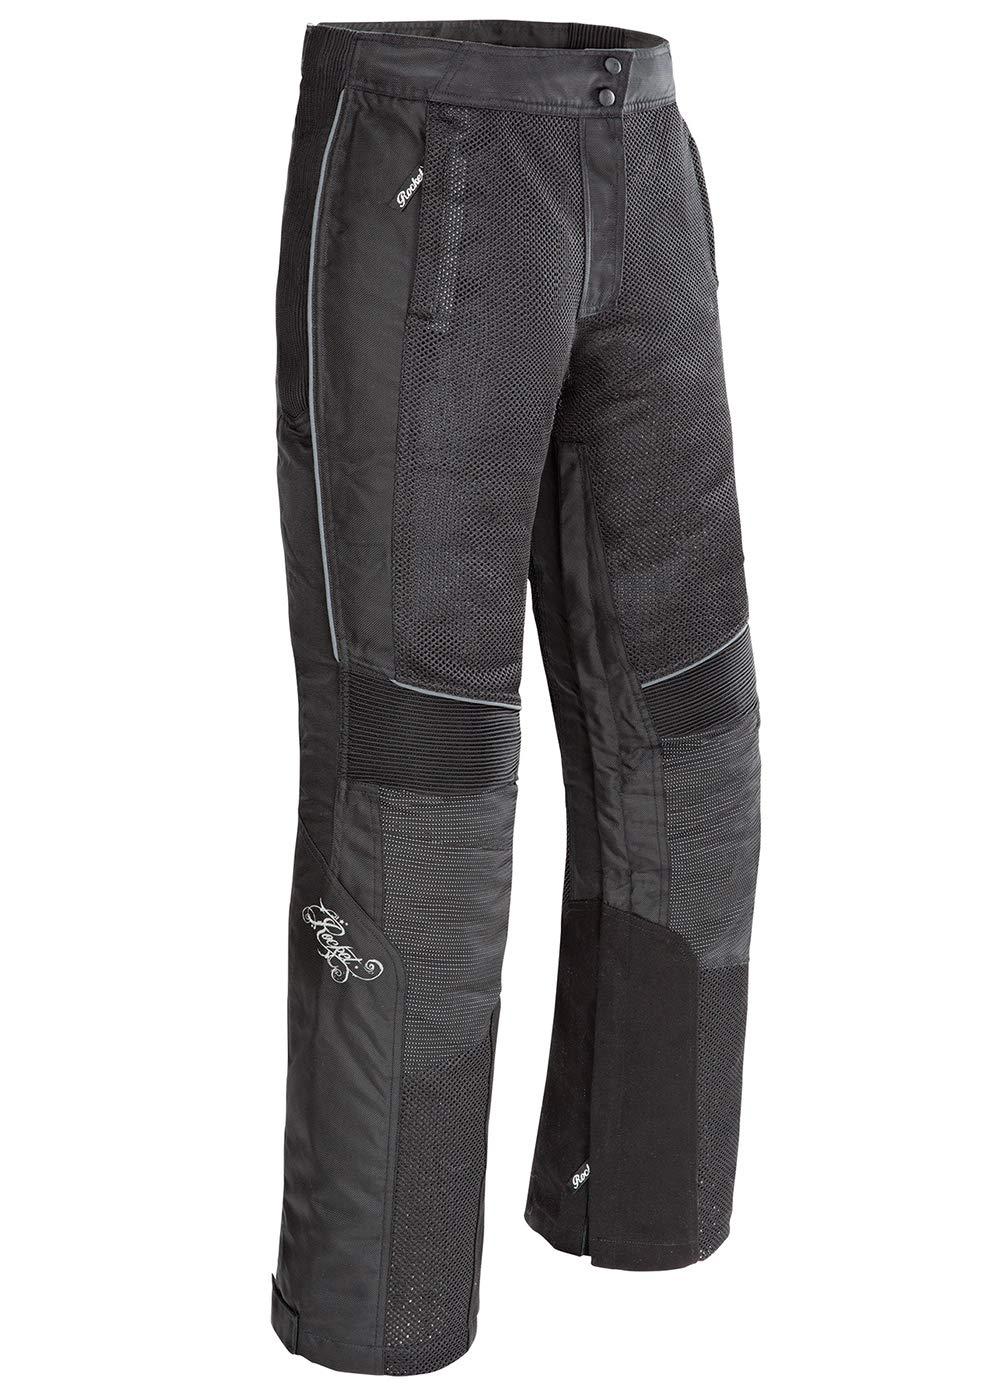 Joe Rocket 1524-2004 Cleo Elite Womens Textile Motorcycle Pants Black, Large